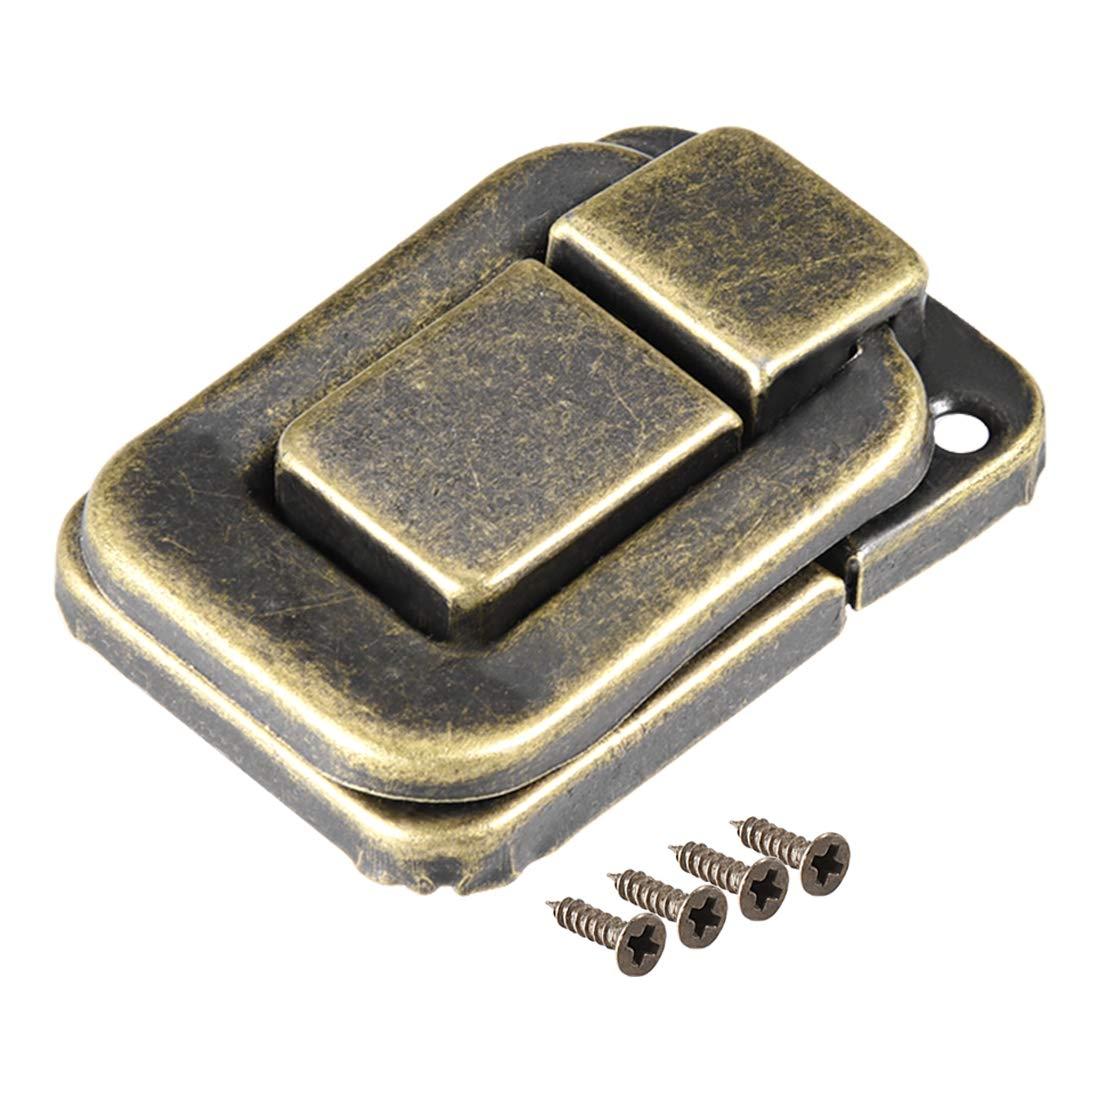 uxcell Toggle Latch, 38mm Retro Style Bronze Decorative Hasp Jewelry Wooden Box Catch w Screws 20 pcs